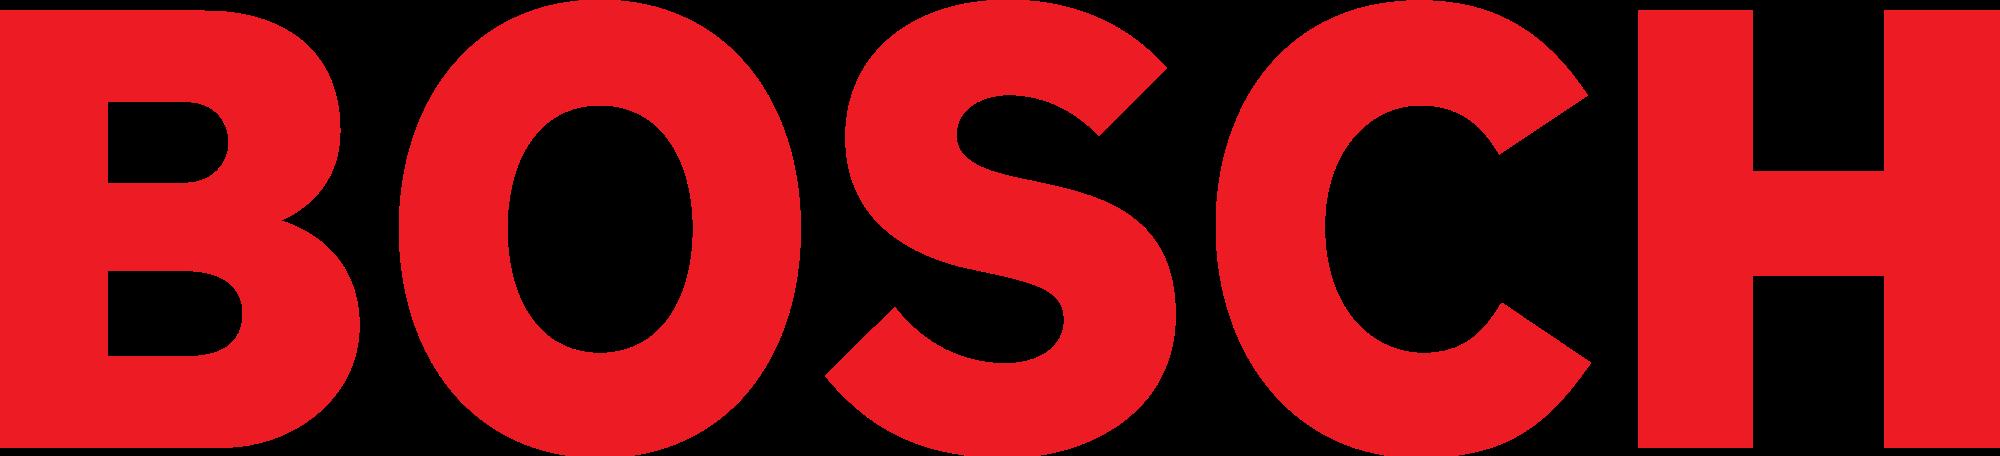 Logo Bosch PNG - 114704